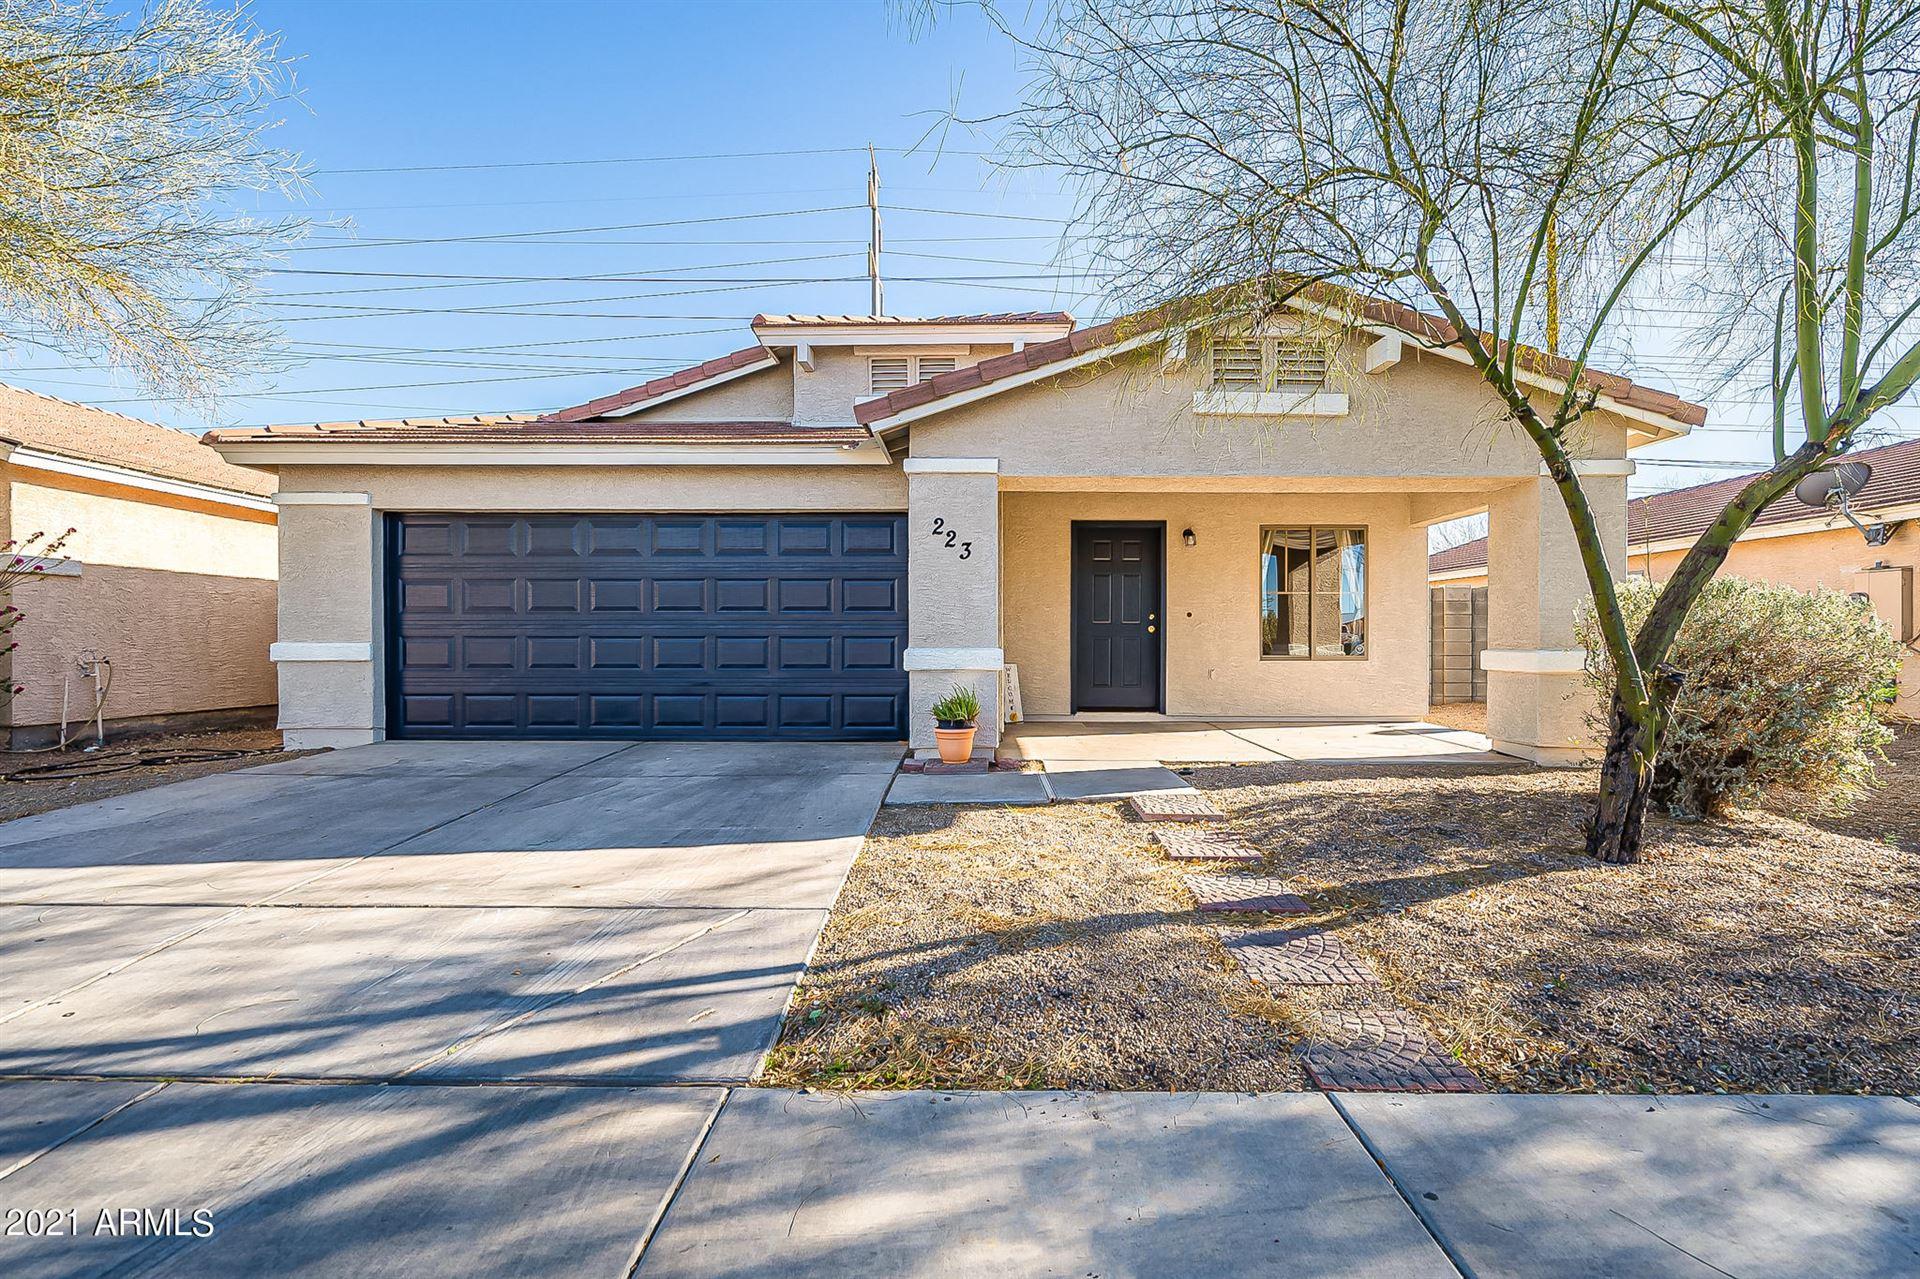 223 W DARROW Street, Phoenix, AZ 85041 - MLS#: 6196612